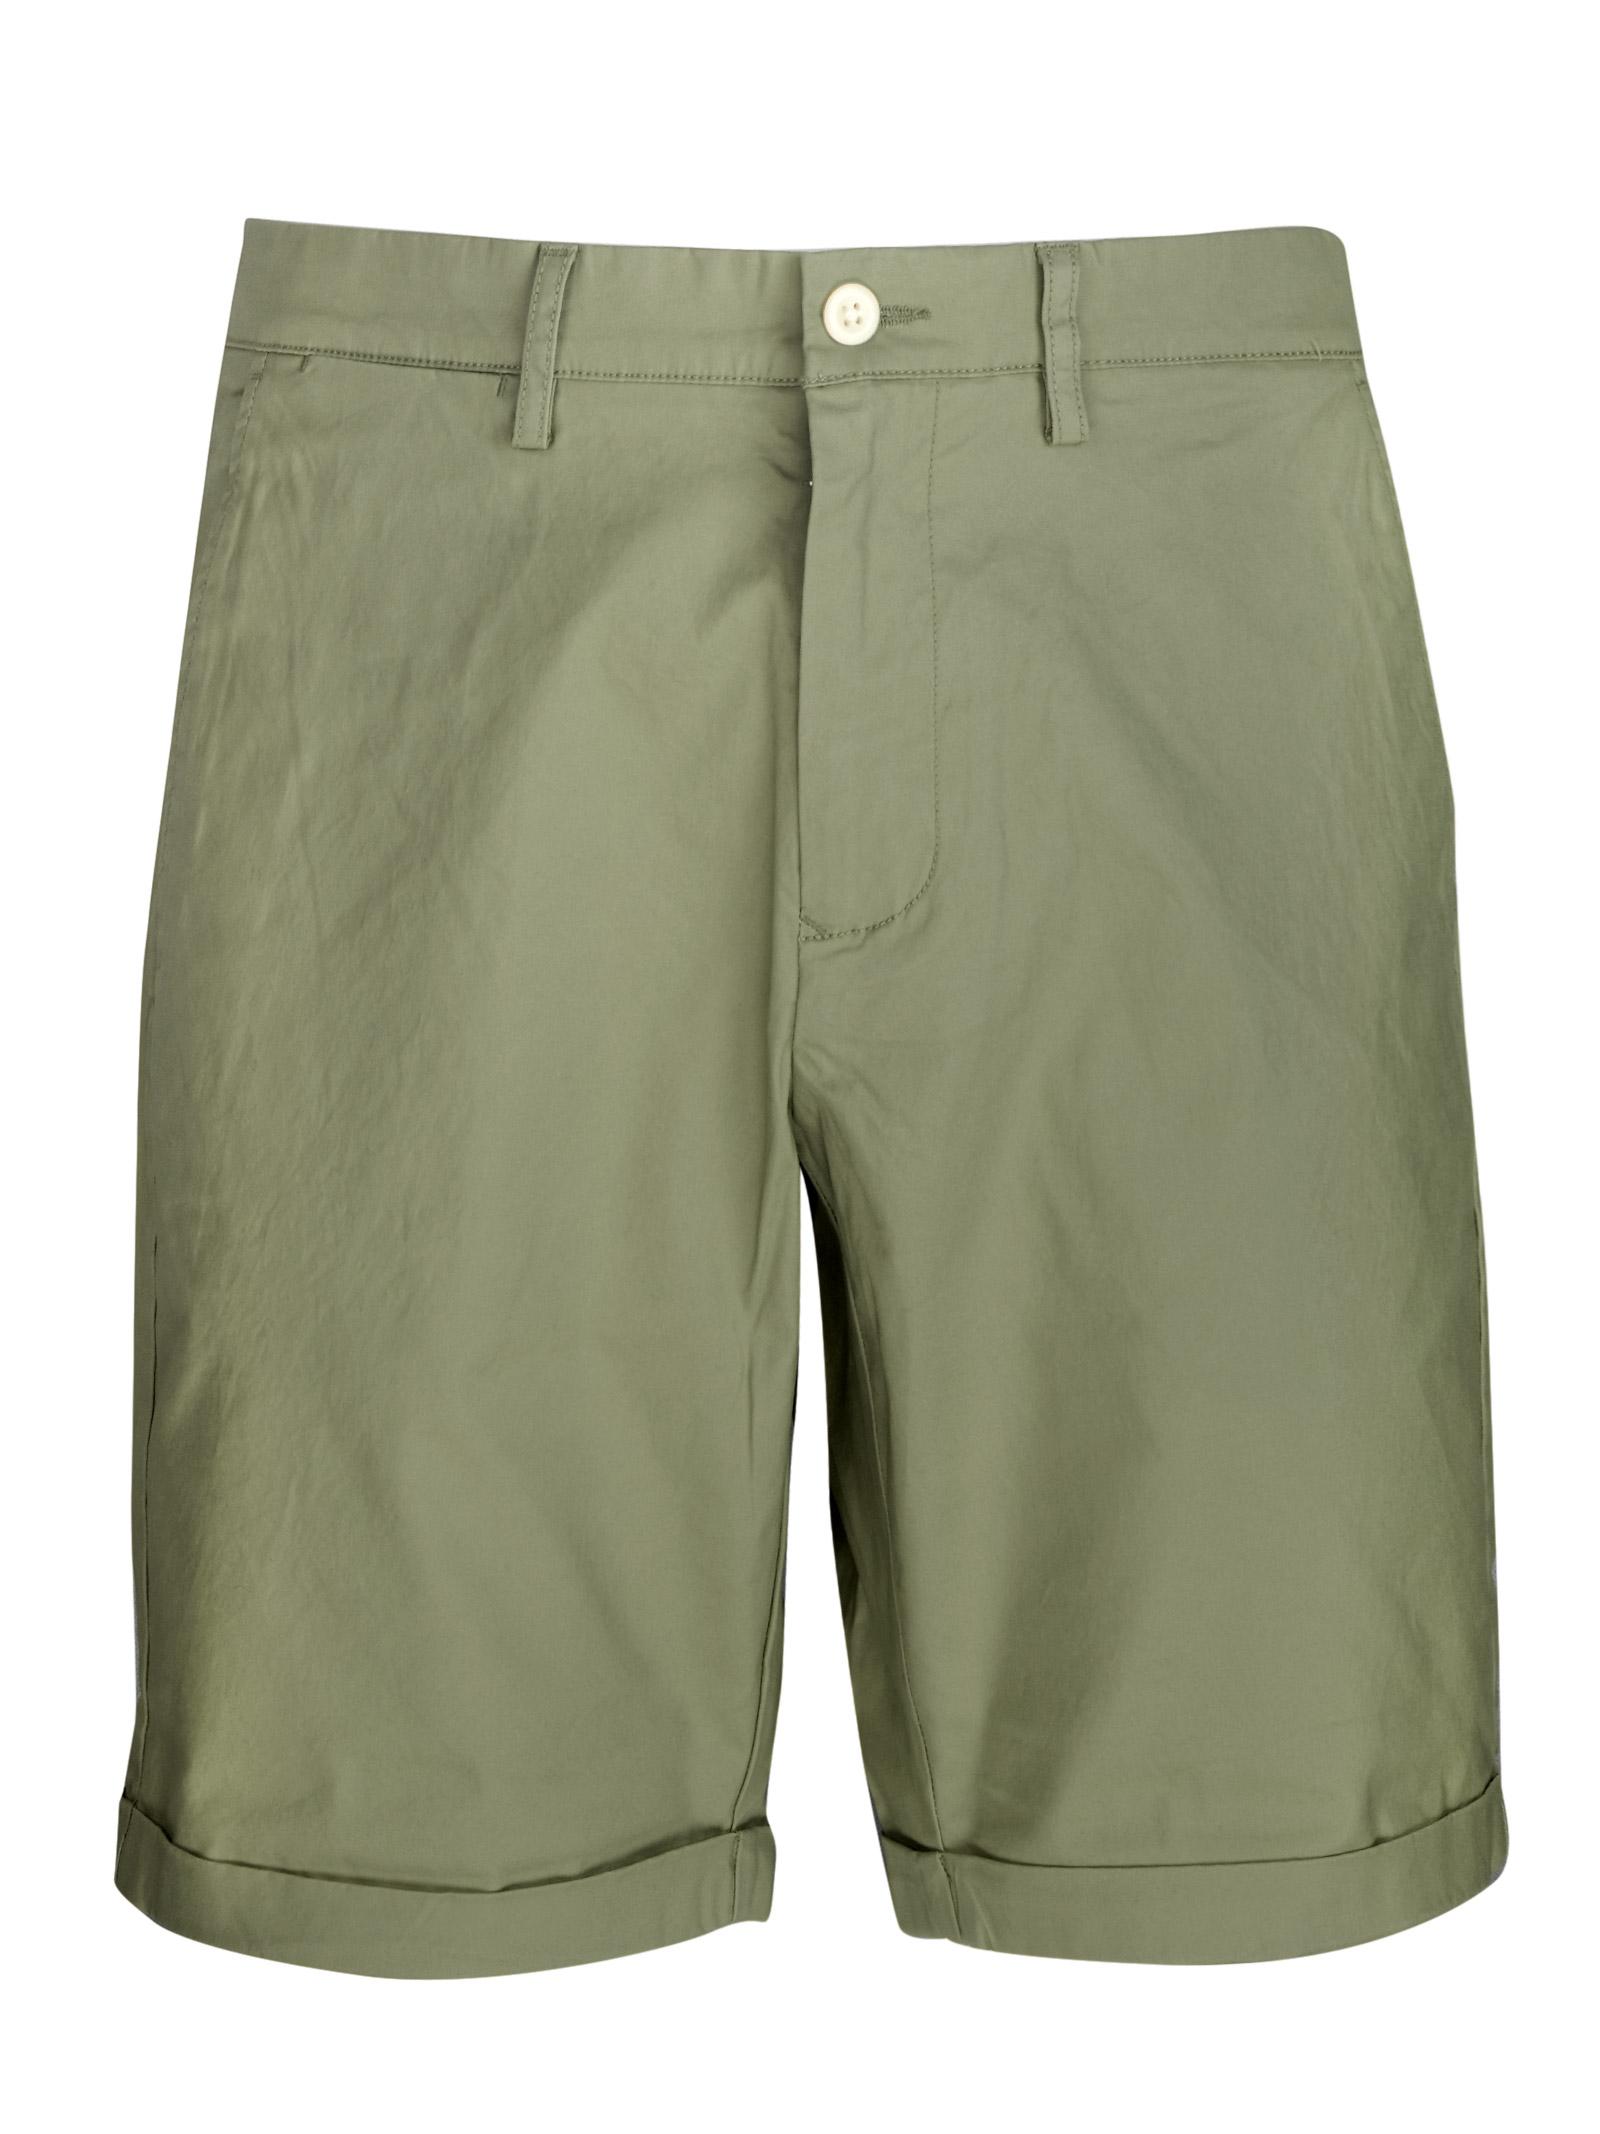 Sun faded Bermuda shorts GANT | Shorts | 200070329